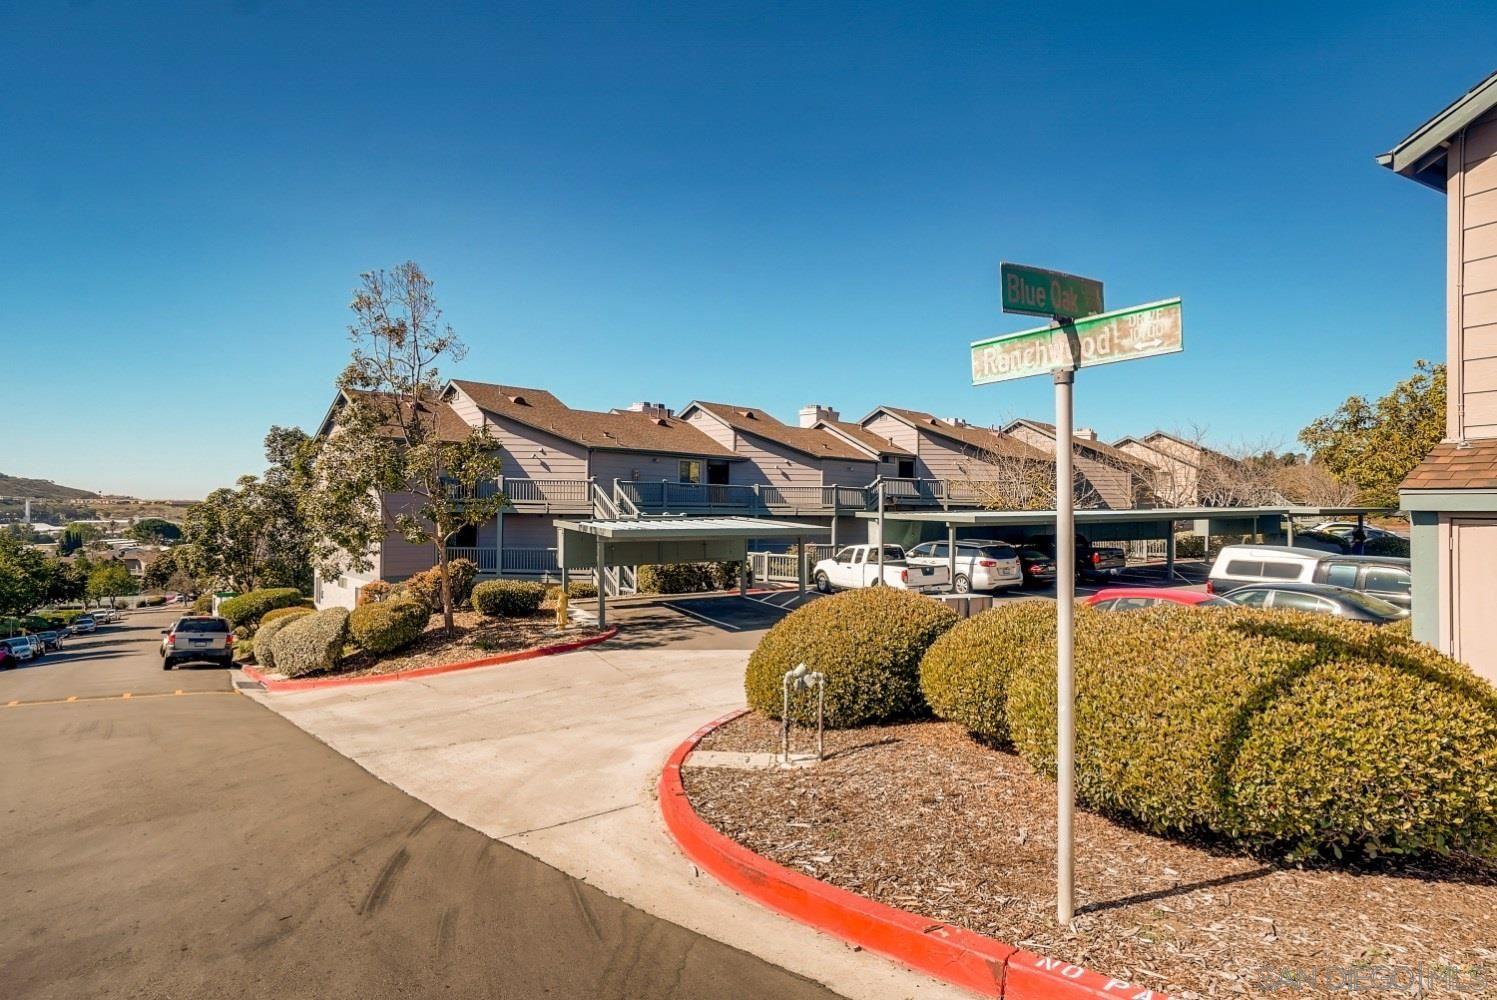 3015 Blue Oak Ct, Spring Valley, CA 91978 - #: 210005251